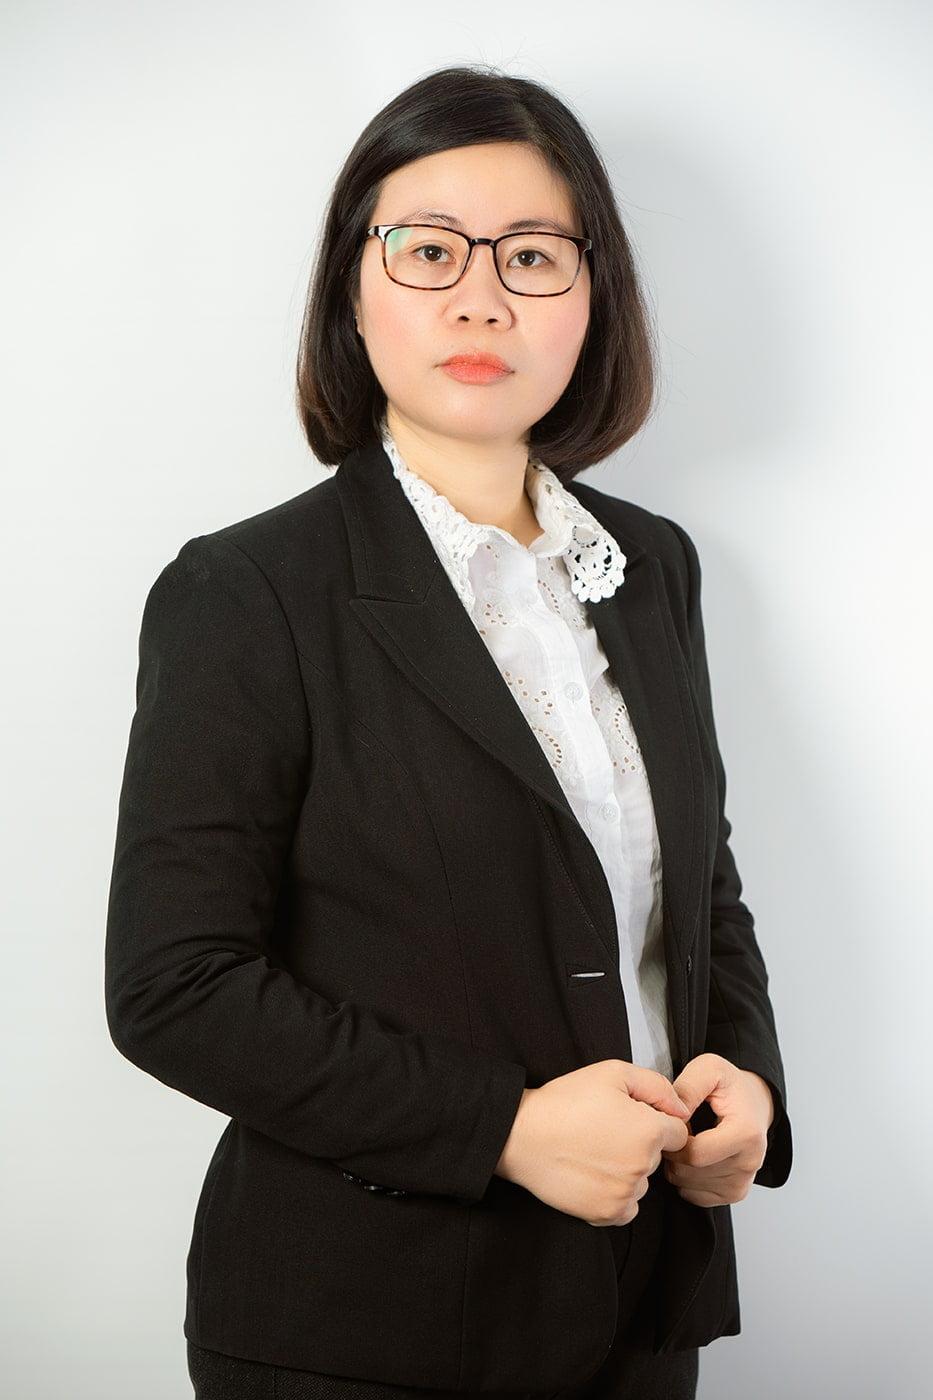 Profile cong ty 25 - Album chụp ảnh profile công ty Luật Dzungsrt Law - HThao Studio